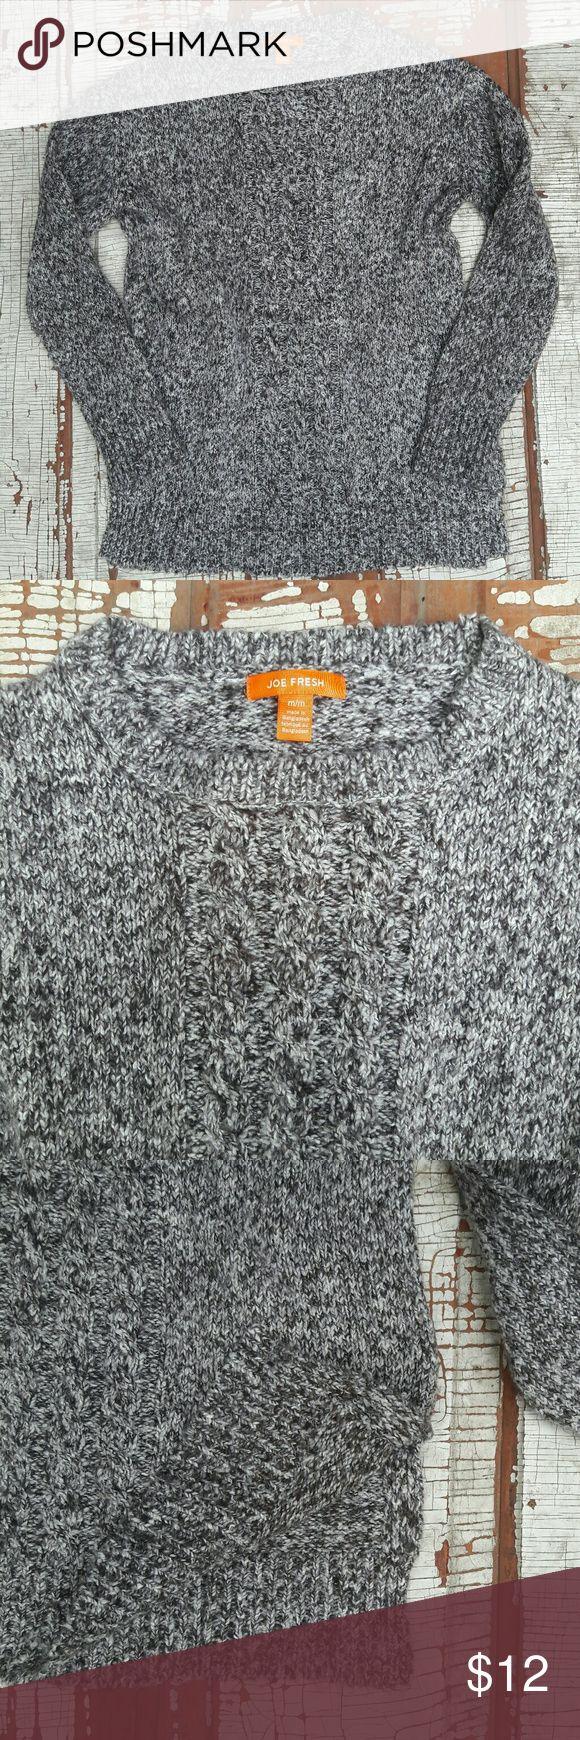 "Joe Fresh knit long sweater Brown medium Joe Fresh long knit sweater with slits up the side.   Shoulders- 19"" Bust-20"" Length- 27"" Arm Inseam-19"" Joe Fresh Sweaters"